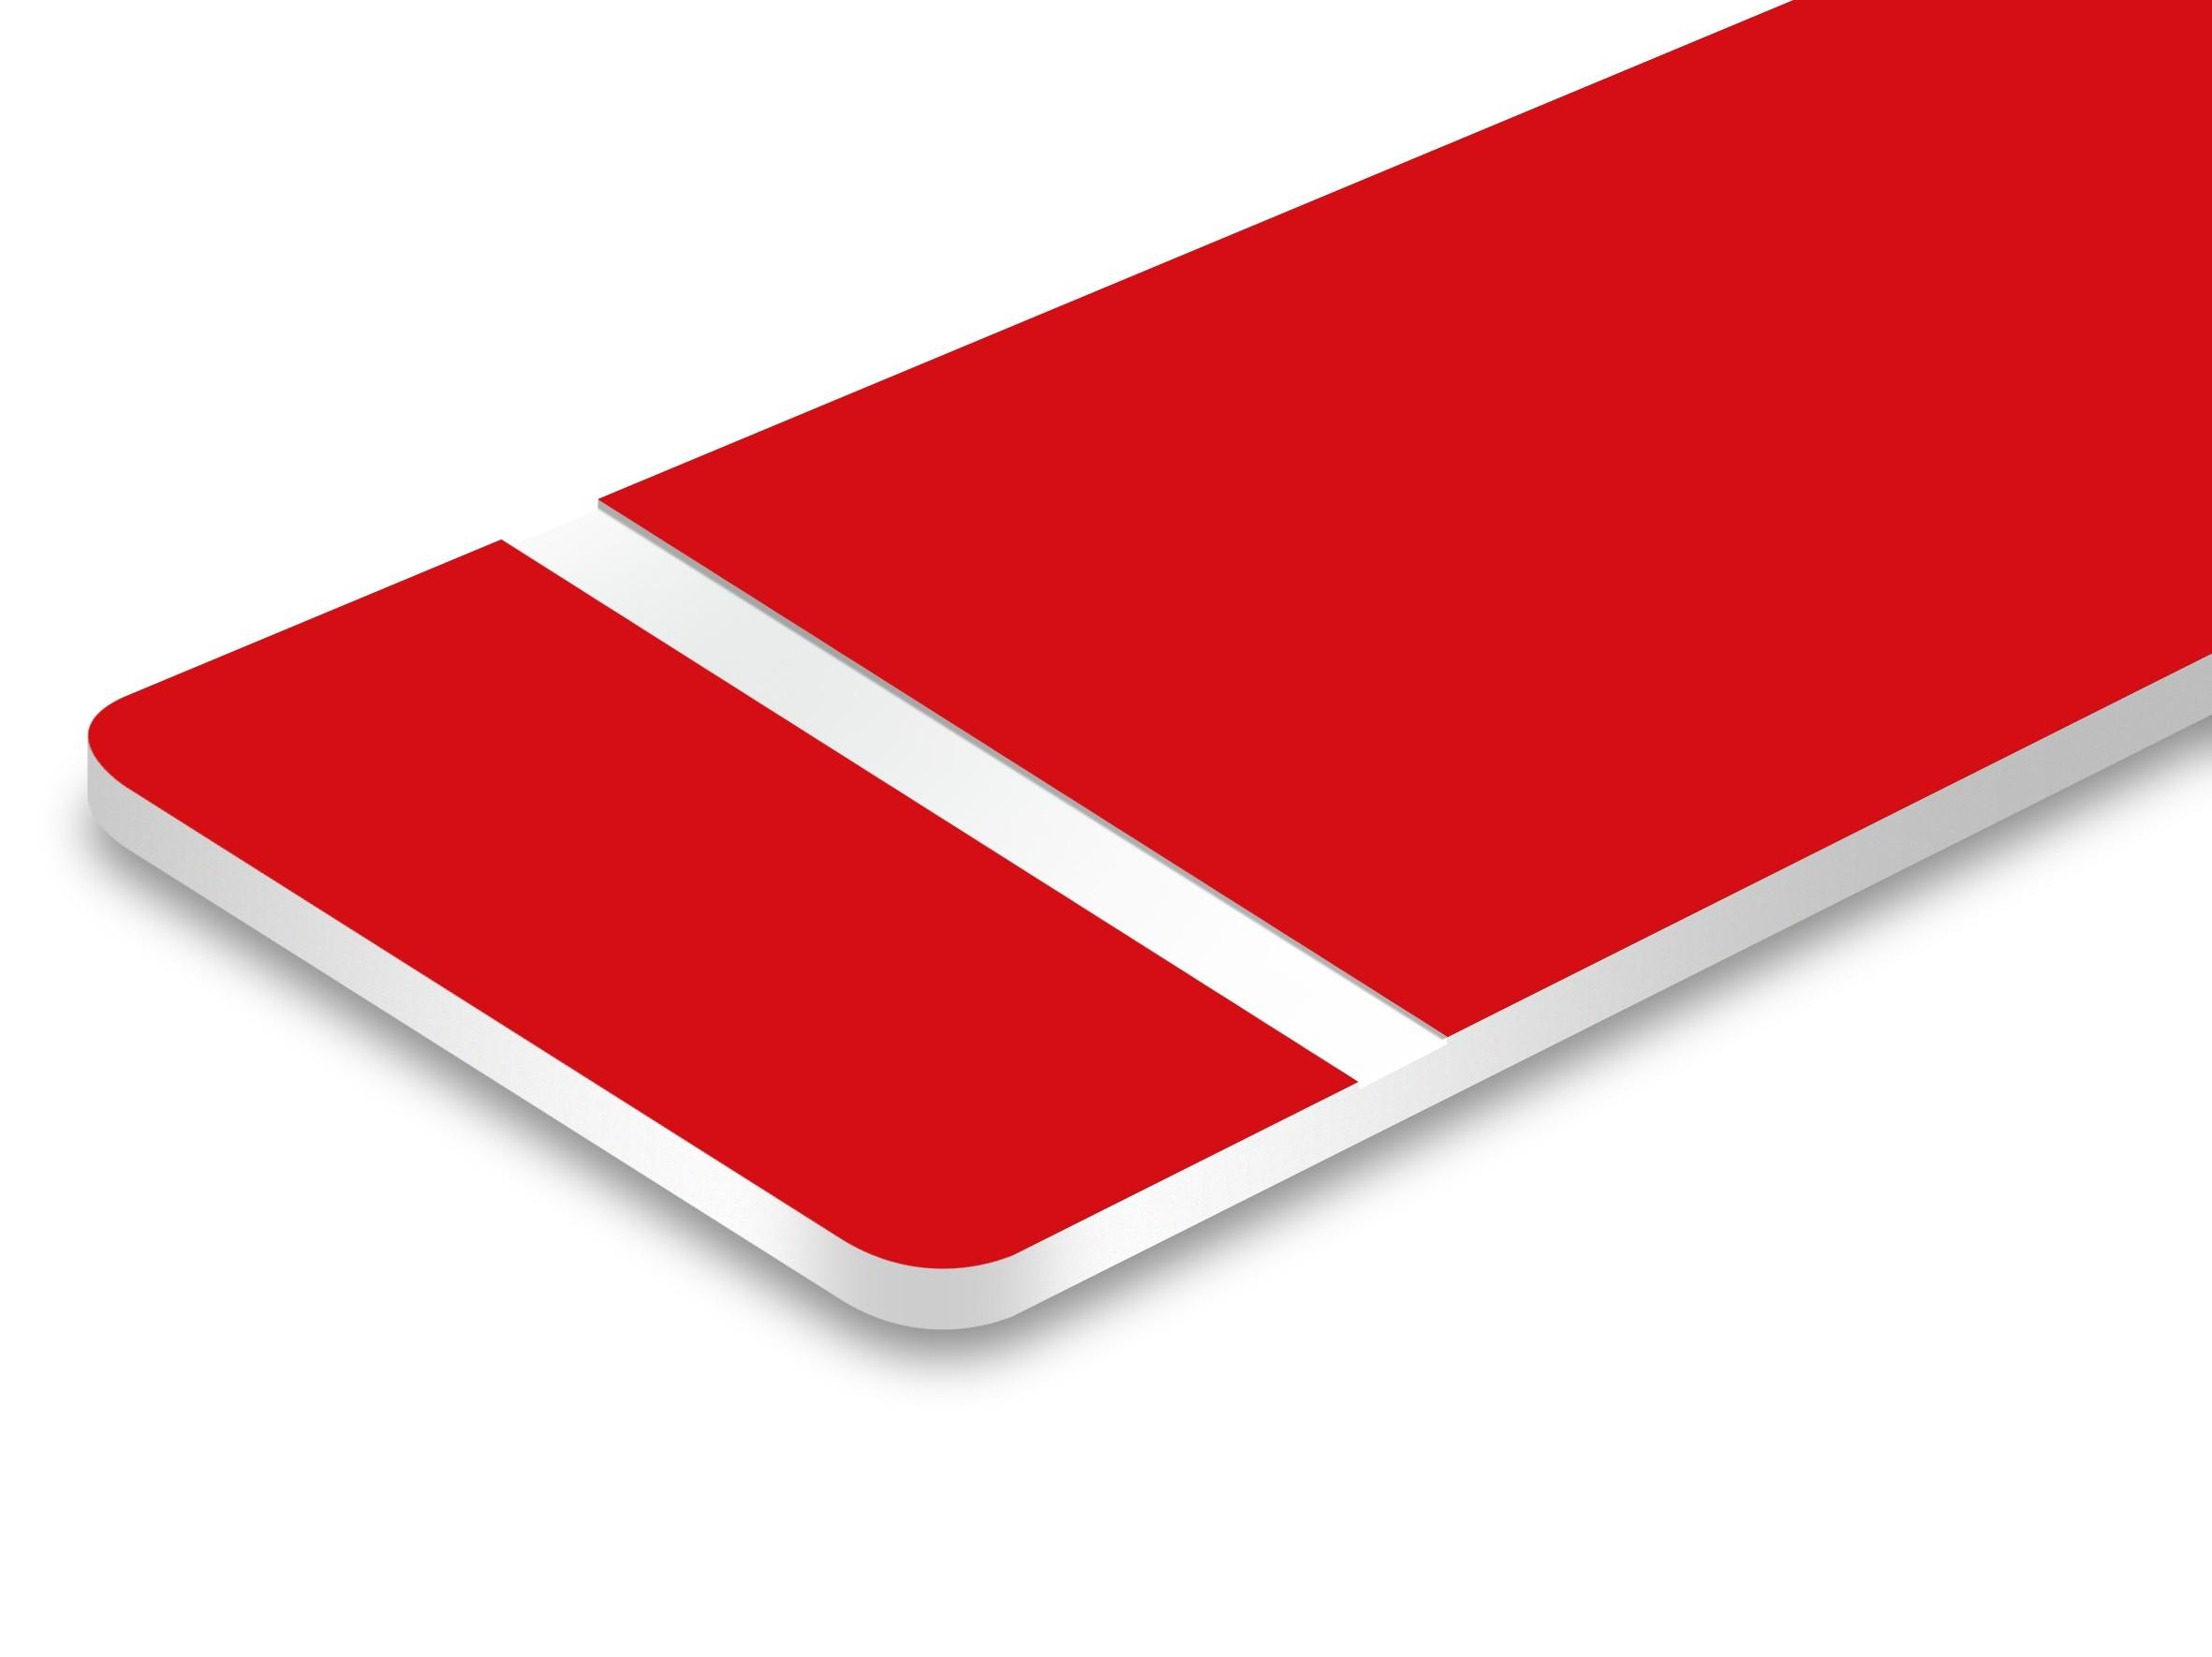 TroLase Ultra matt red/white 1.5 mm